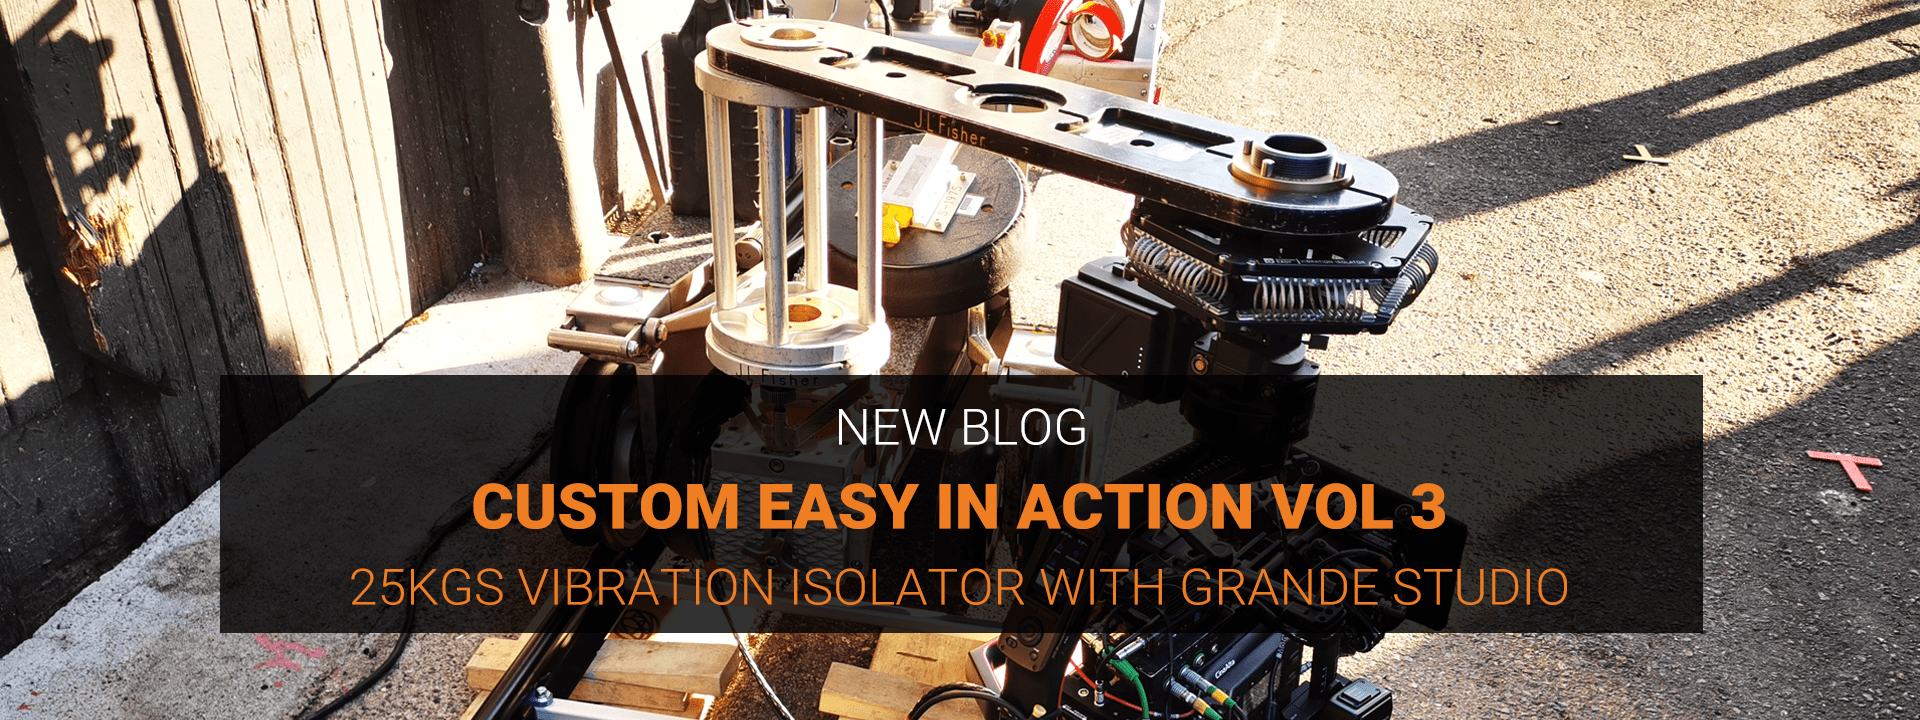 Custom Easy in Action Vol 3